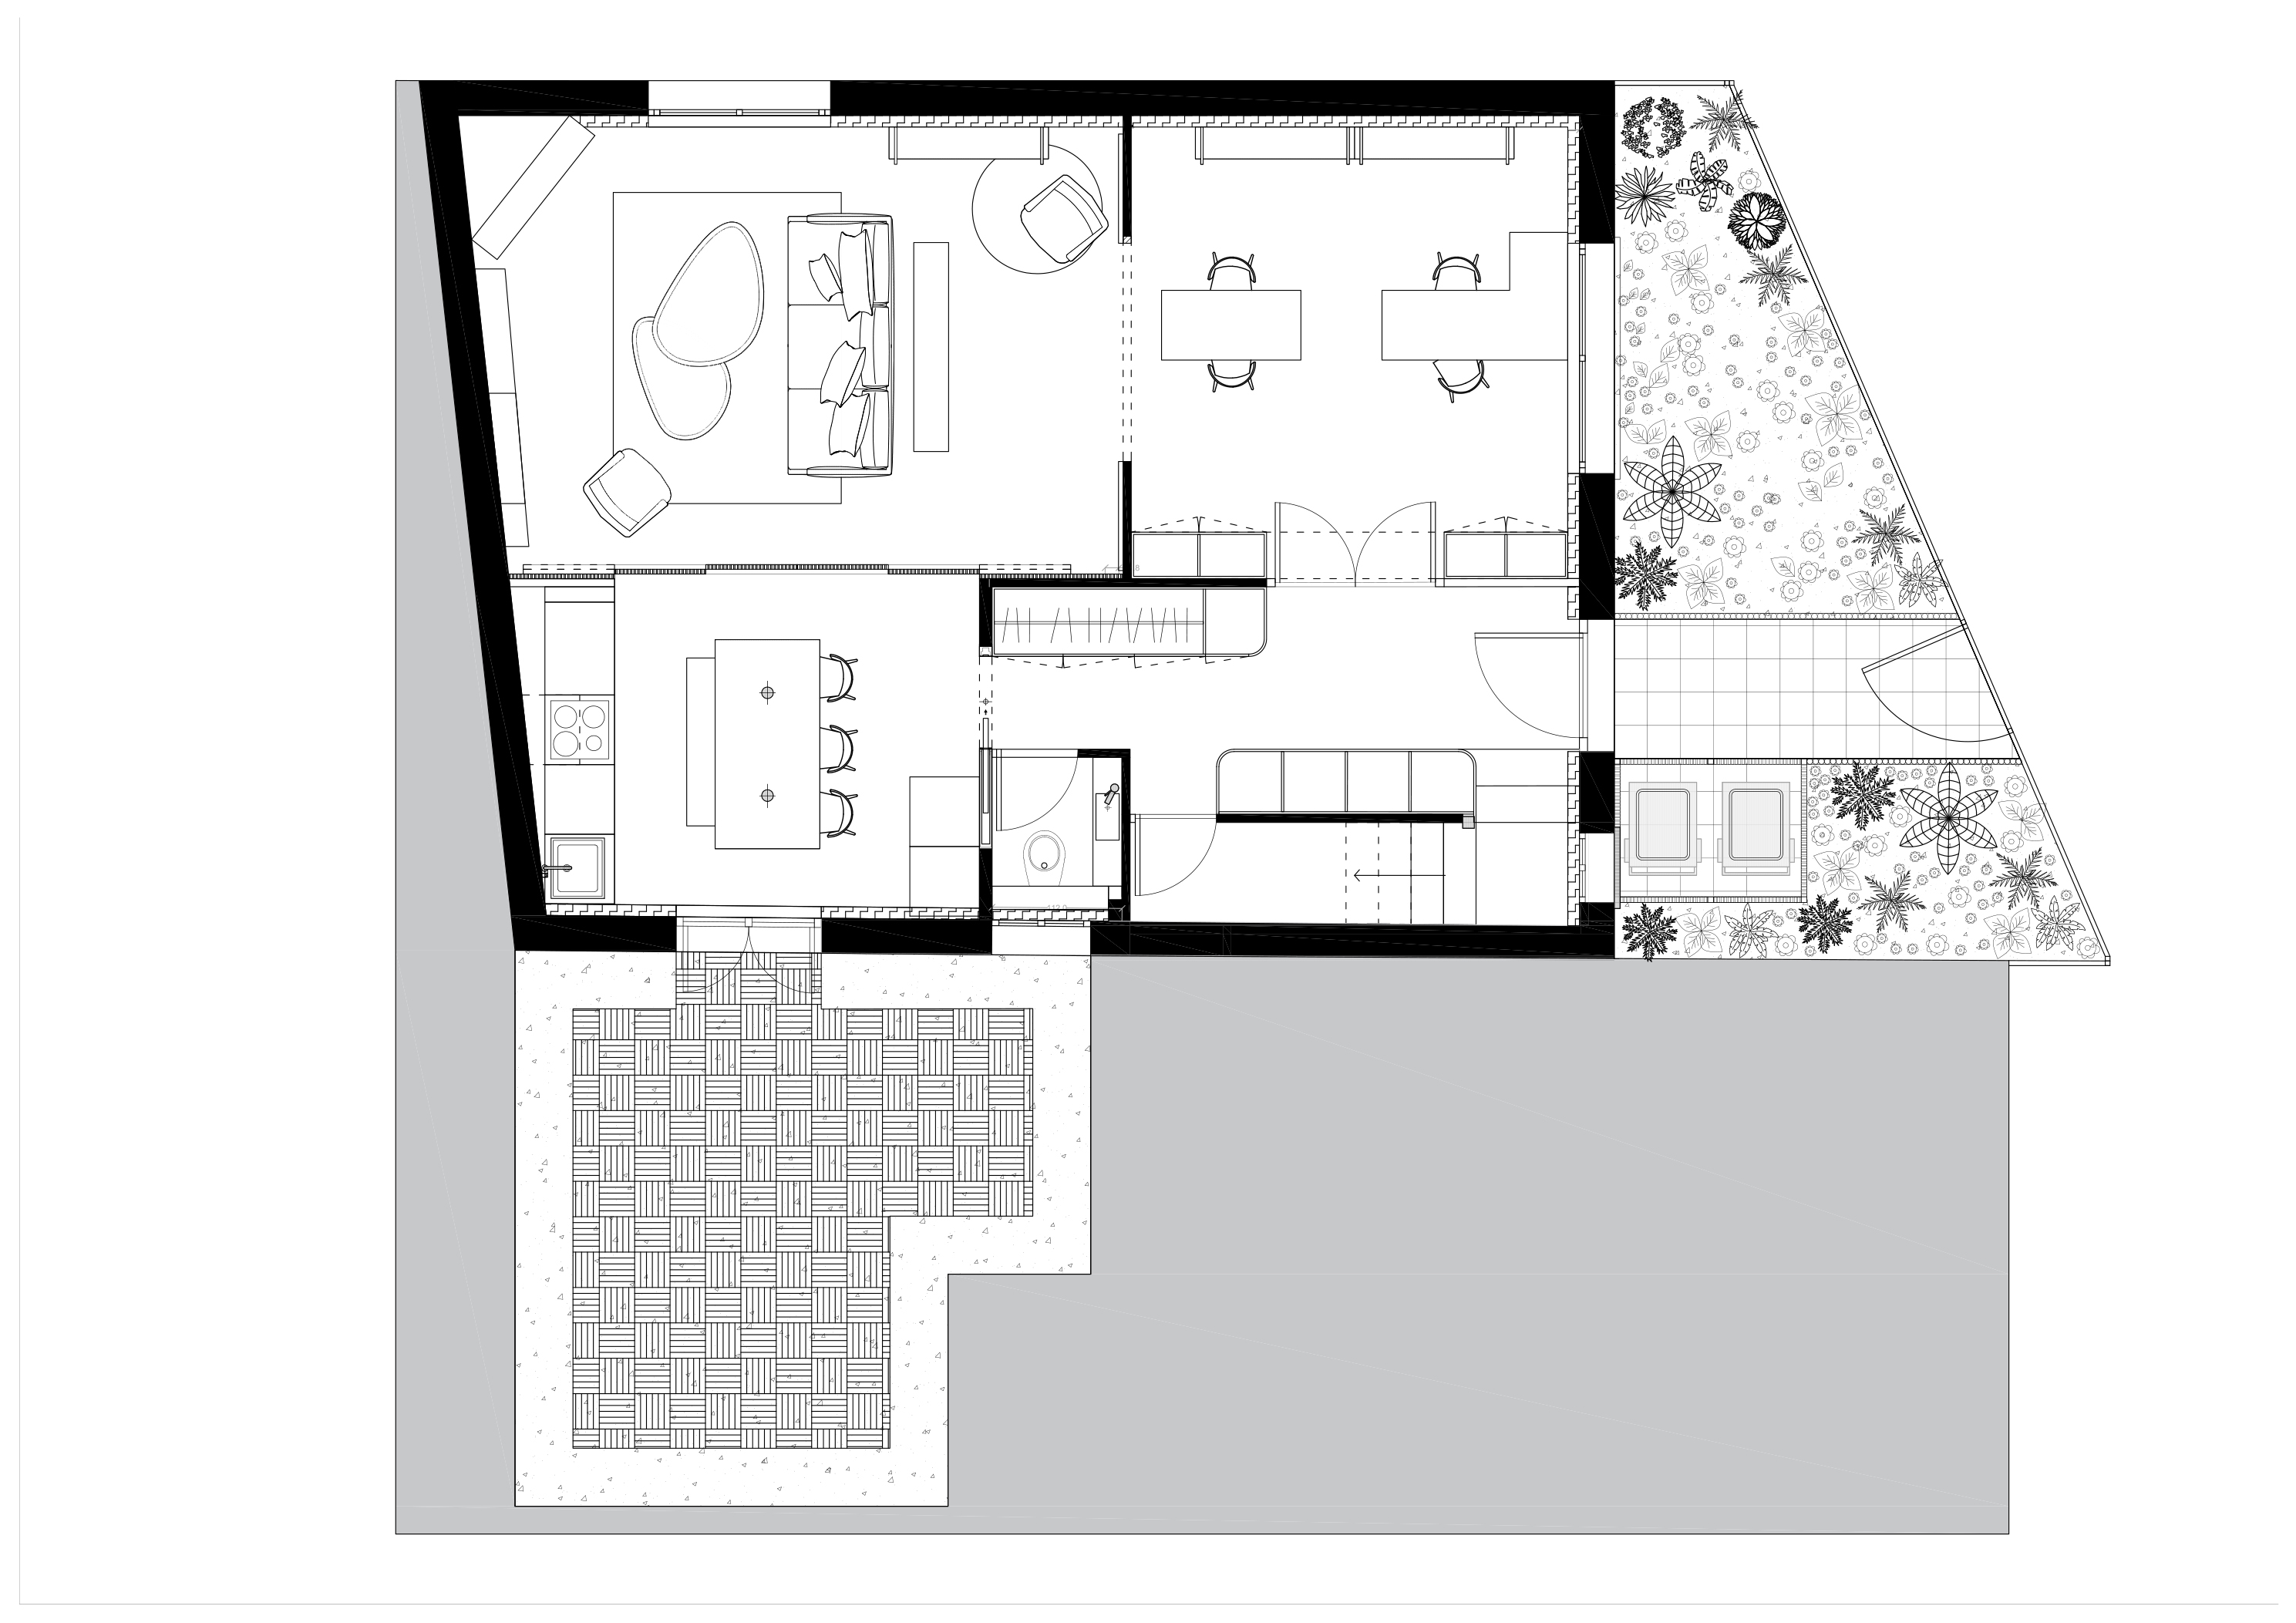 D:FREELANCELE HAILLANDWG170619-projet plan site (1)